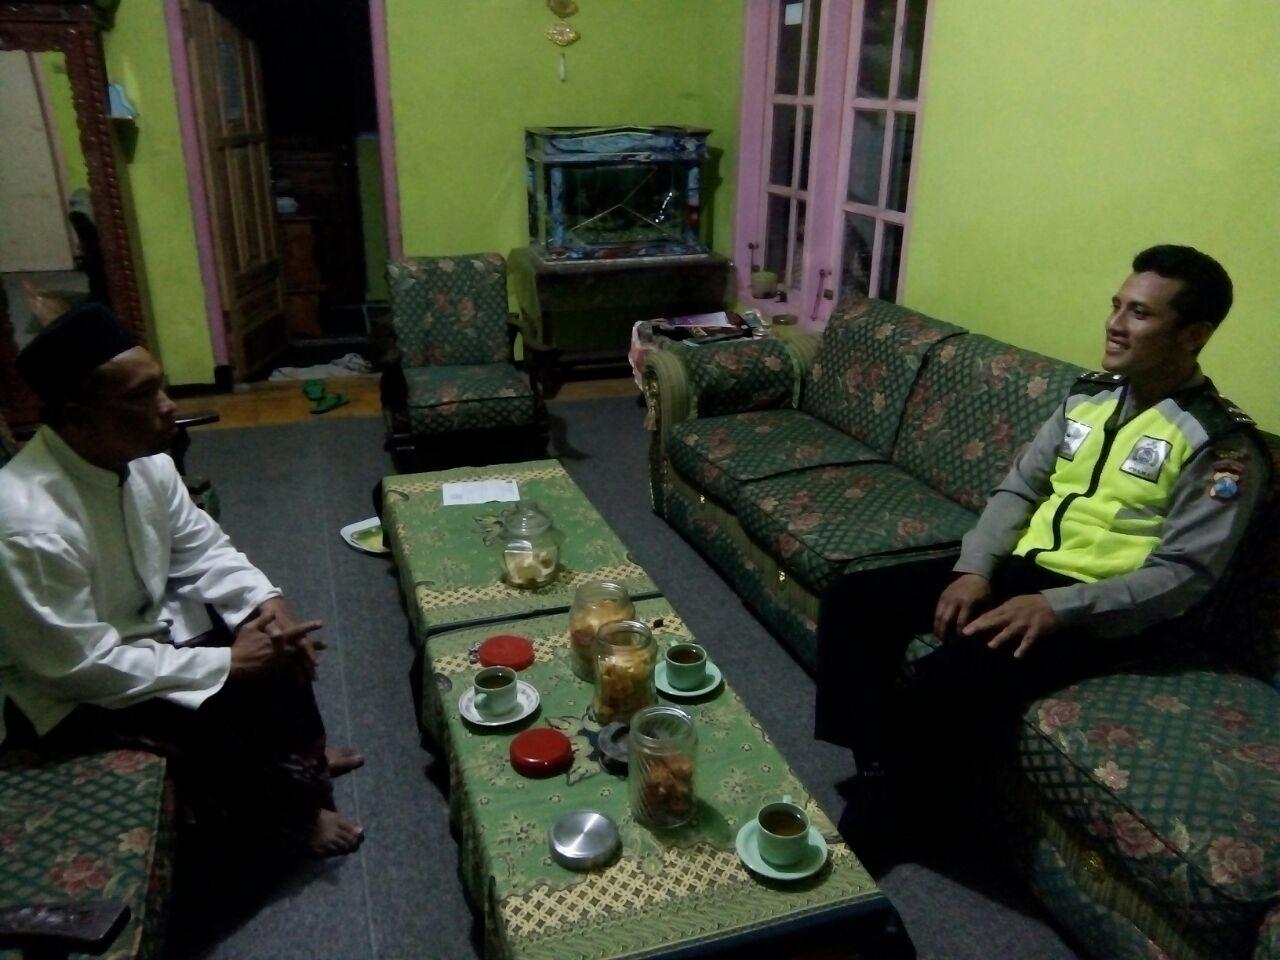 Para Anggota Bhabinkamtibmas Polsek Pujon Polres Batu Melaksanakan Silaturahmi Tokoh Agama Desa Madiredo